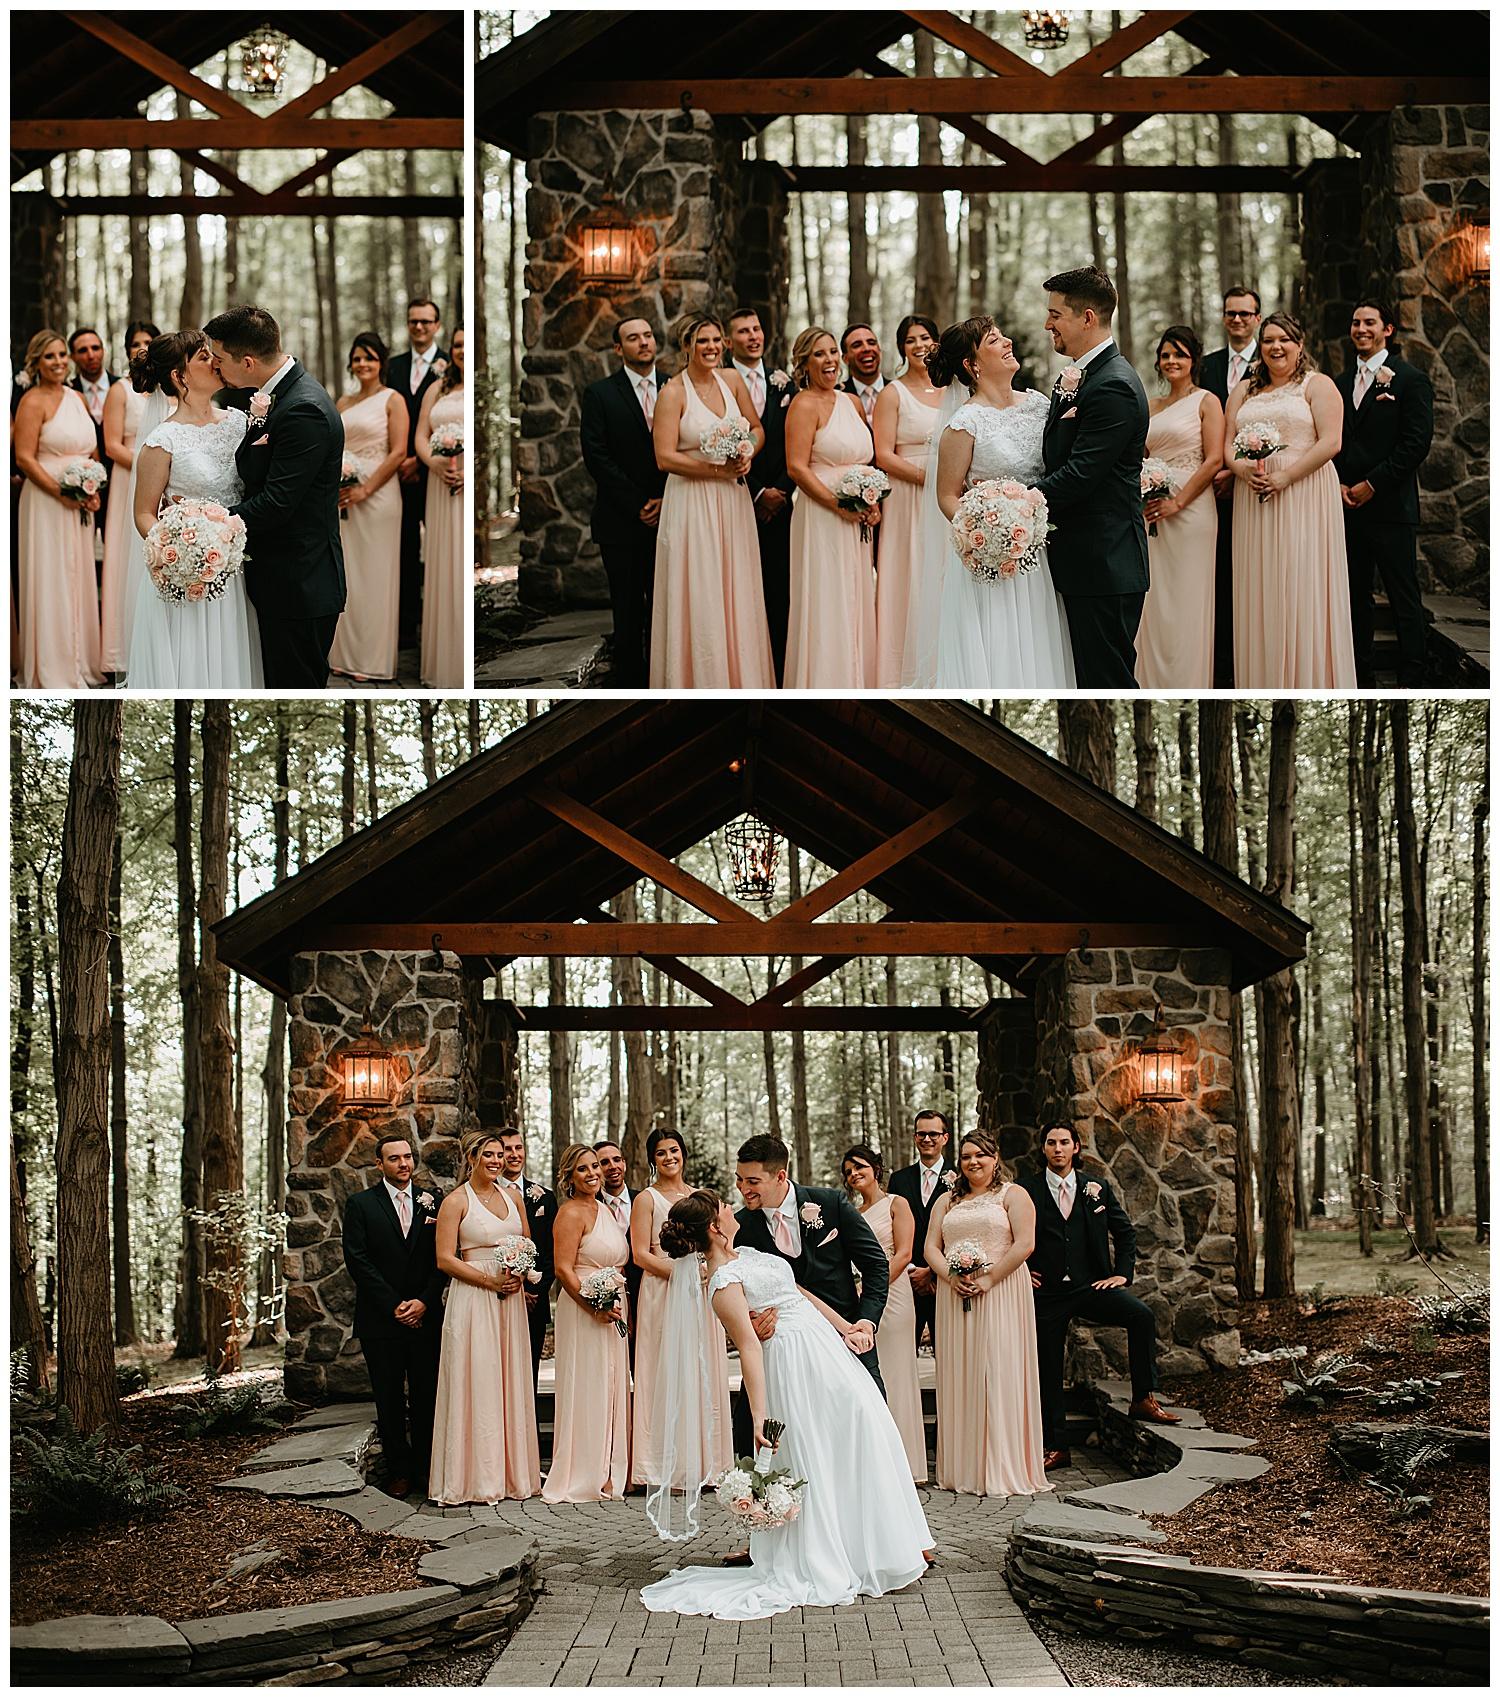 NEPA-Mount-Pocono-Wedding-Photographer-at-the-Stroudsmoor-Country-Inn-Stroudsburg-PA_0041.jpg